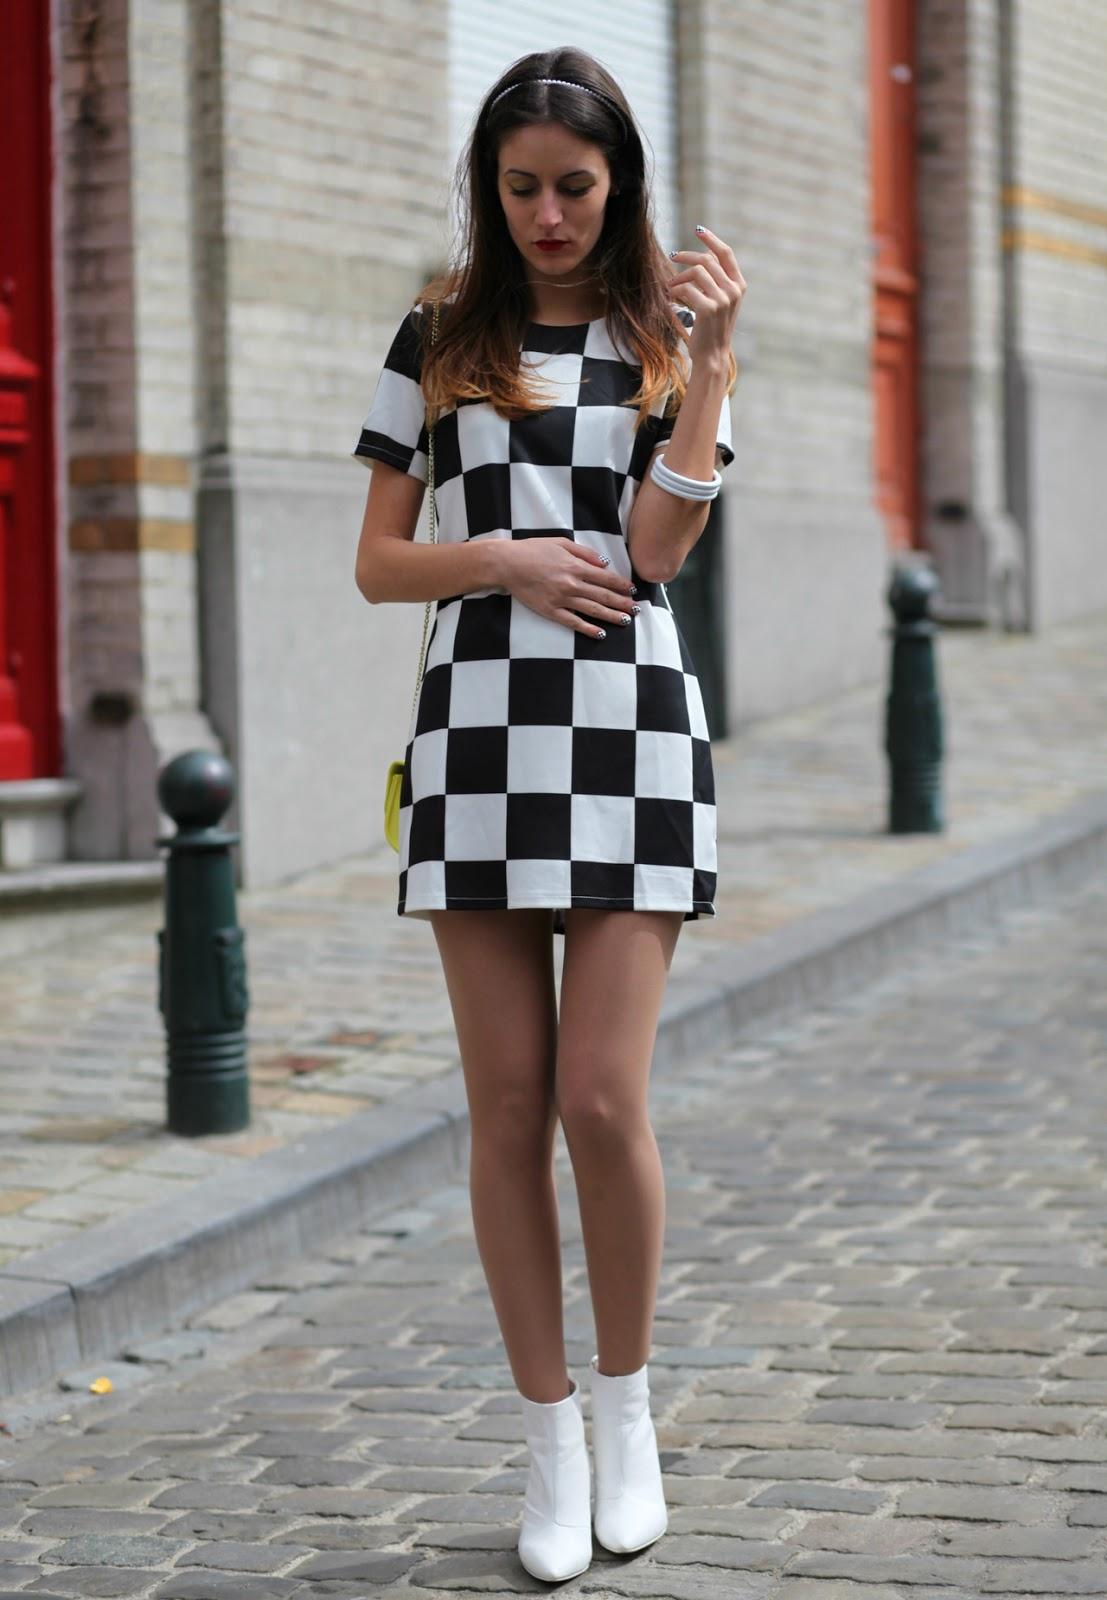 Favorito Outfit Cresima Ragazza PH18 » Regardsdefemmes MG18